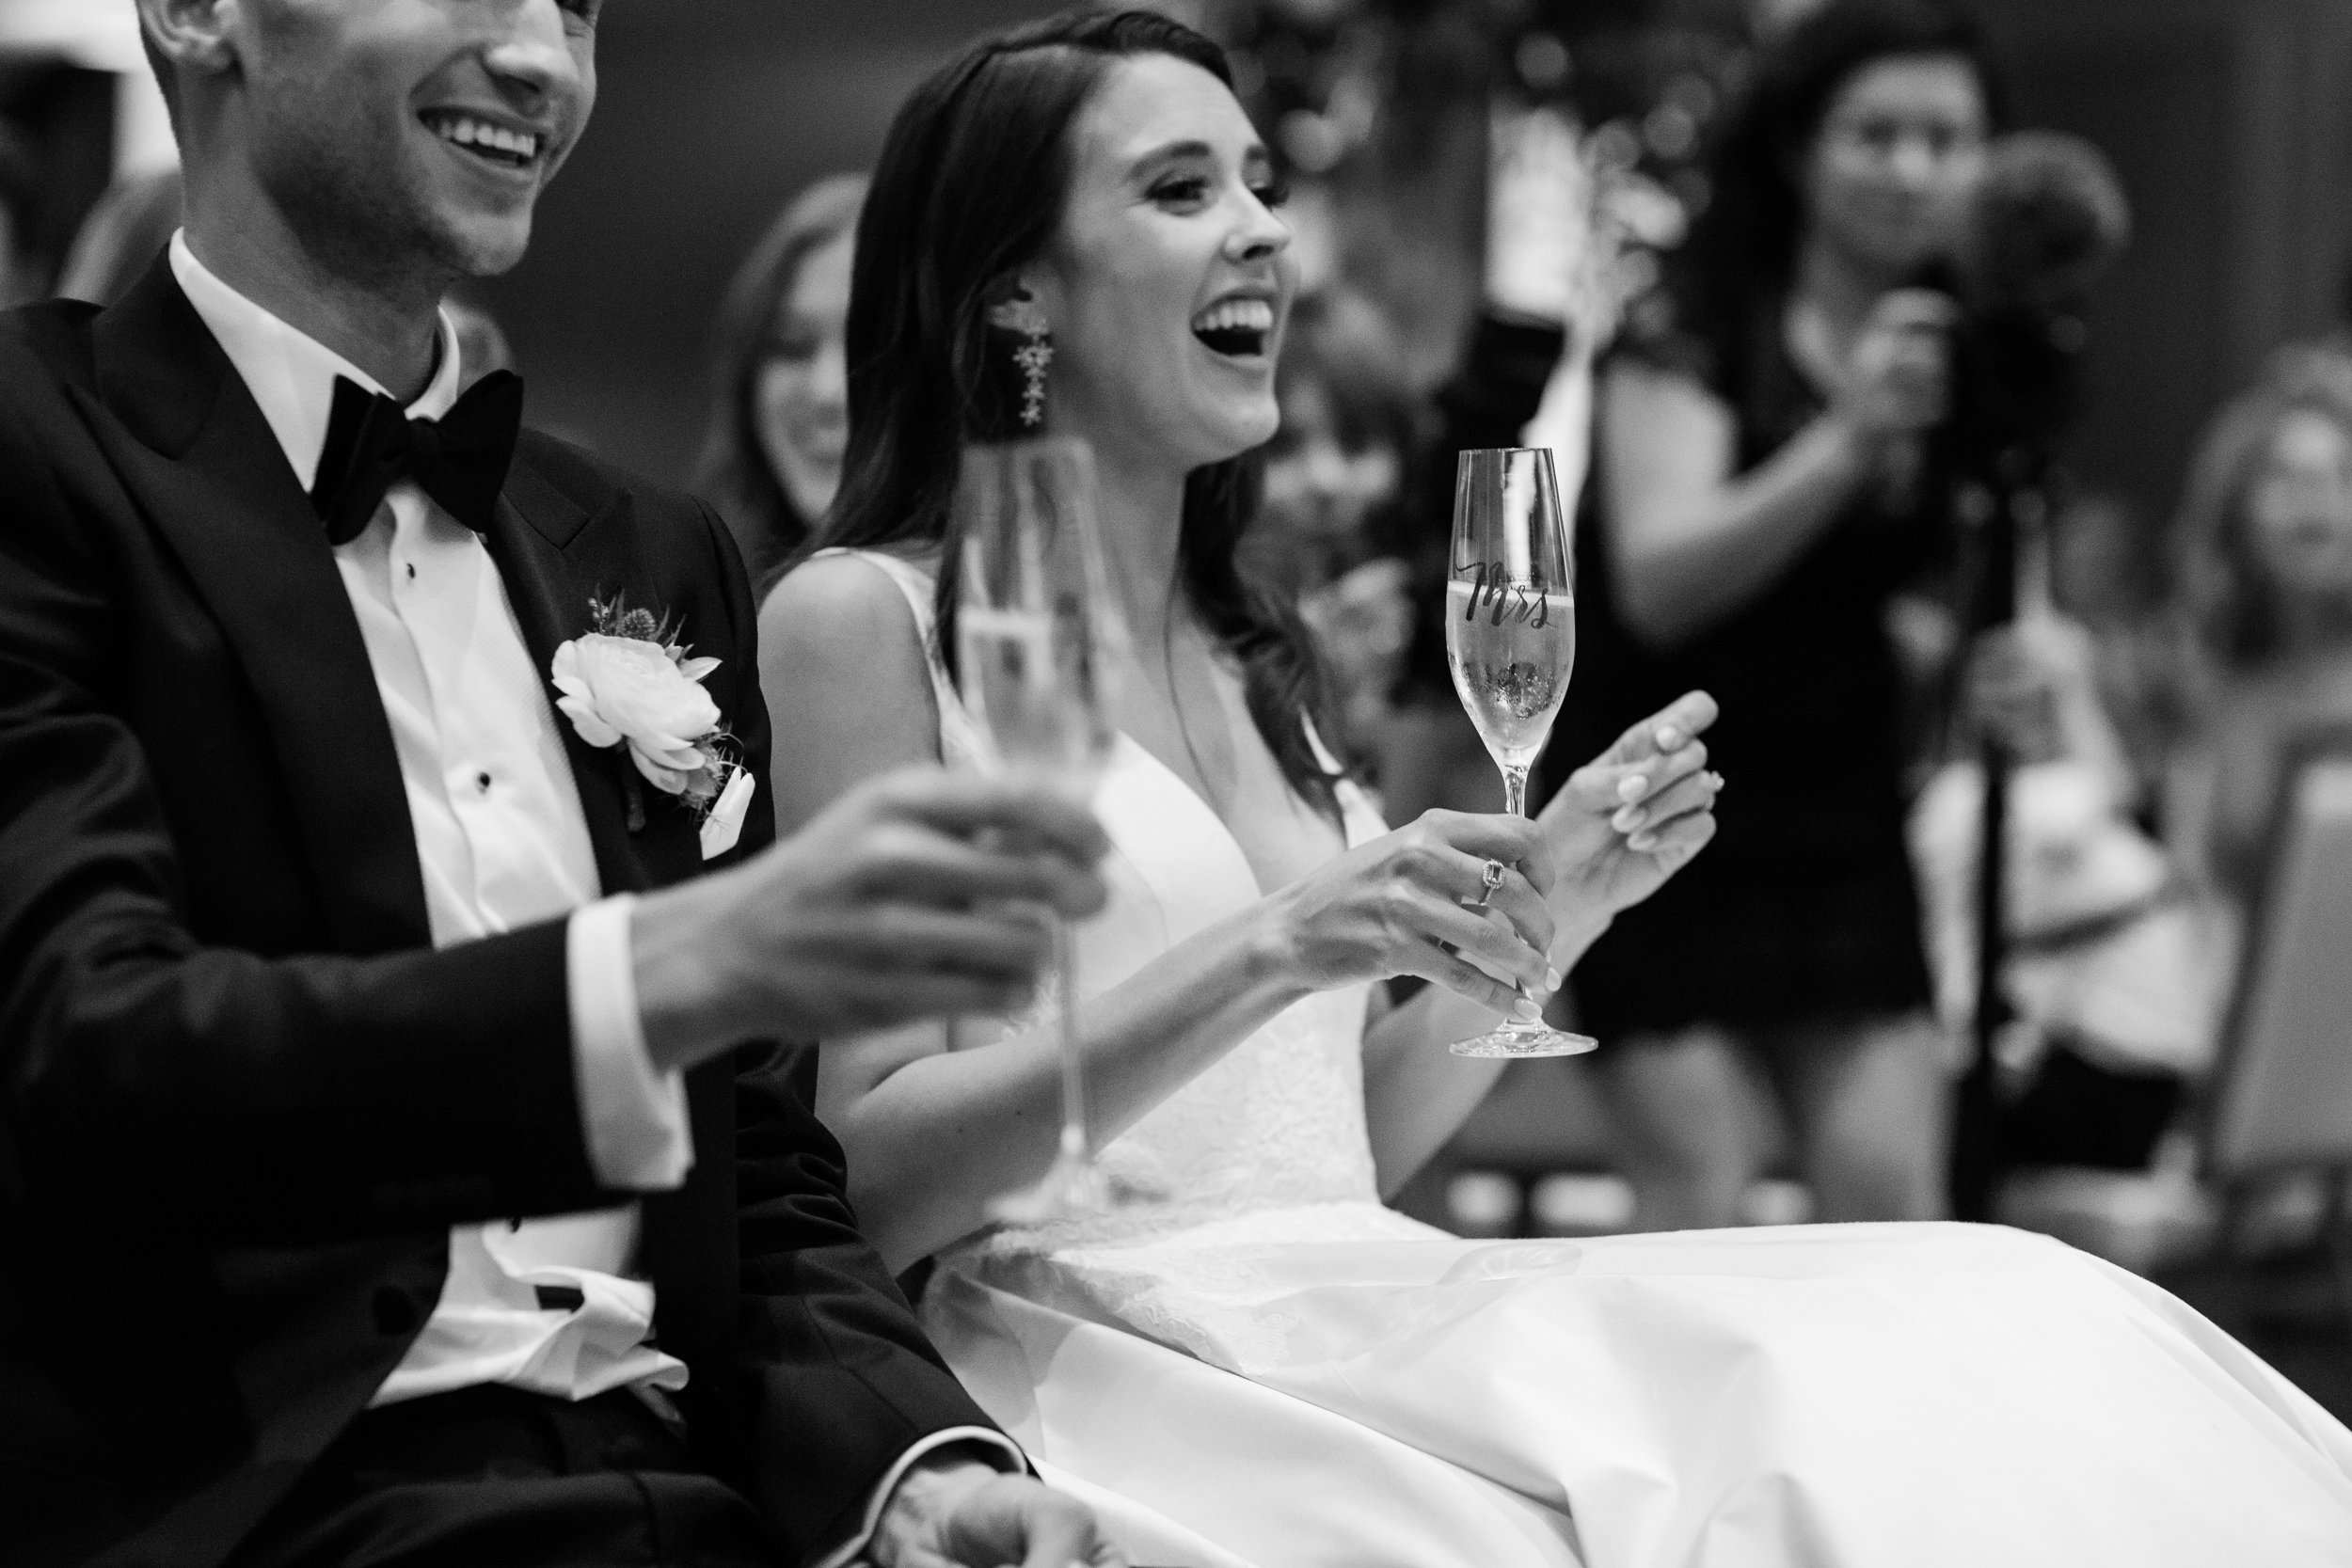 st-anthony-hotel-wedding-photography-10136san-antonio.JPG